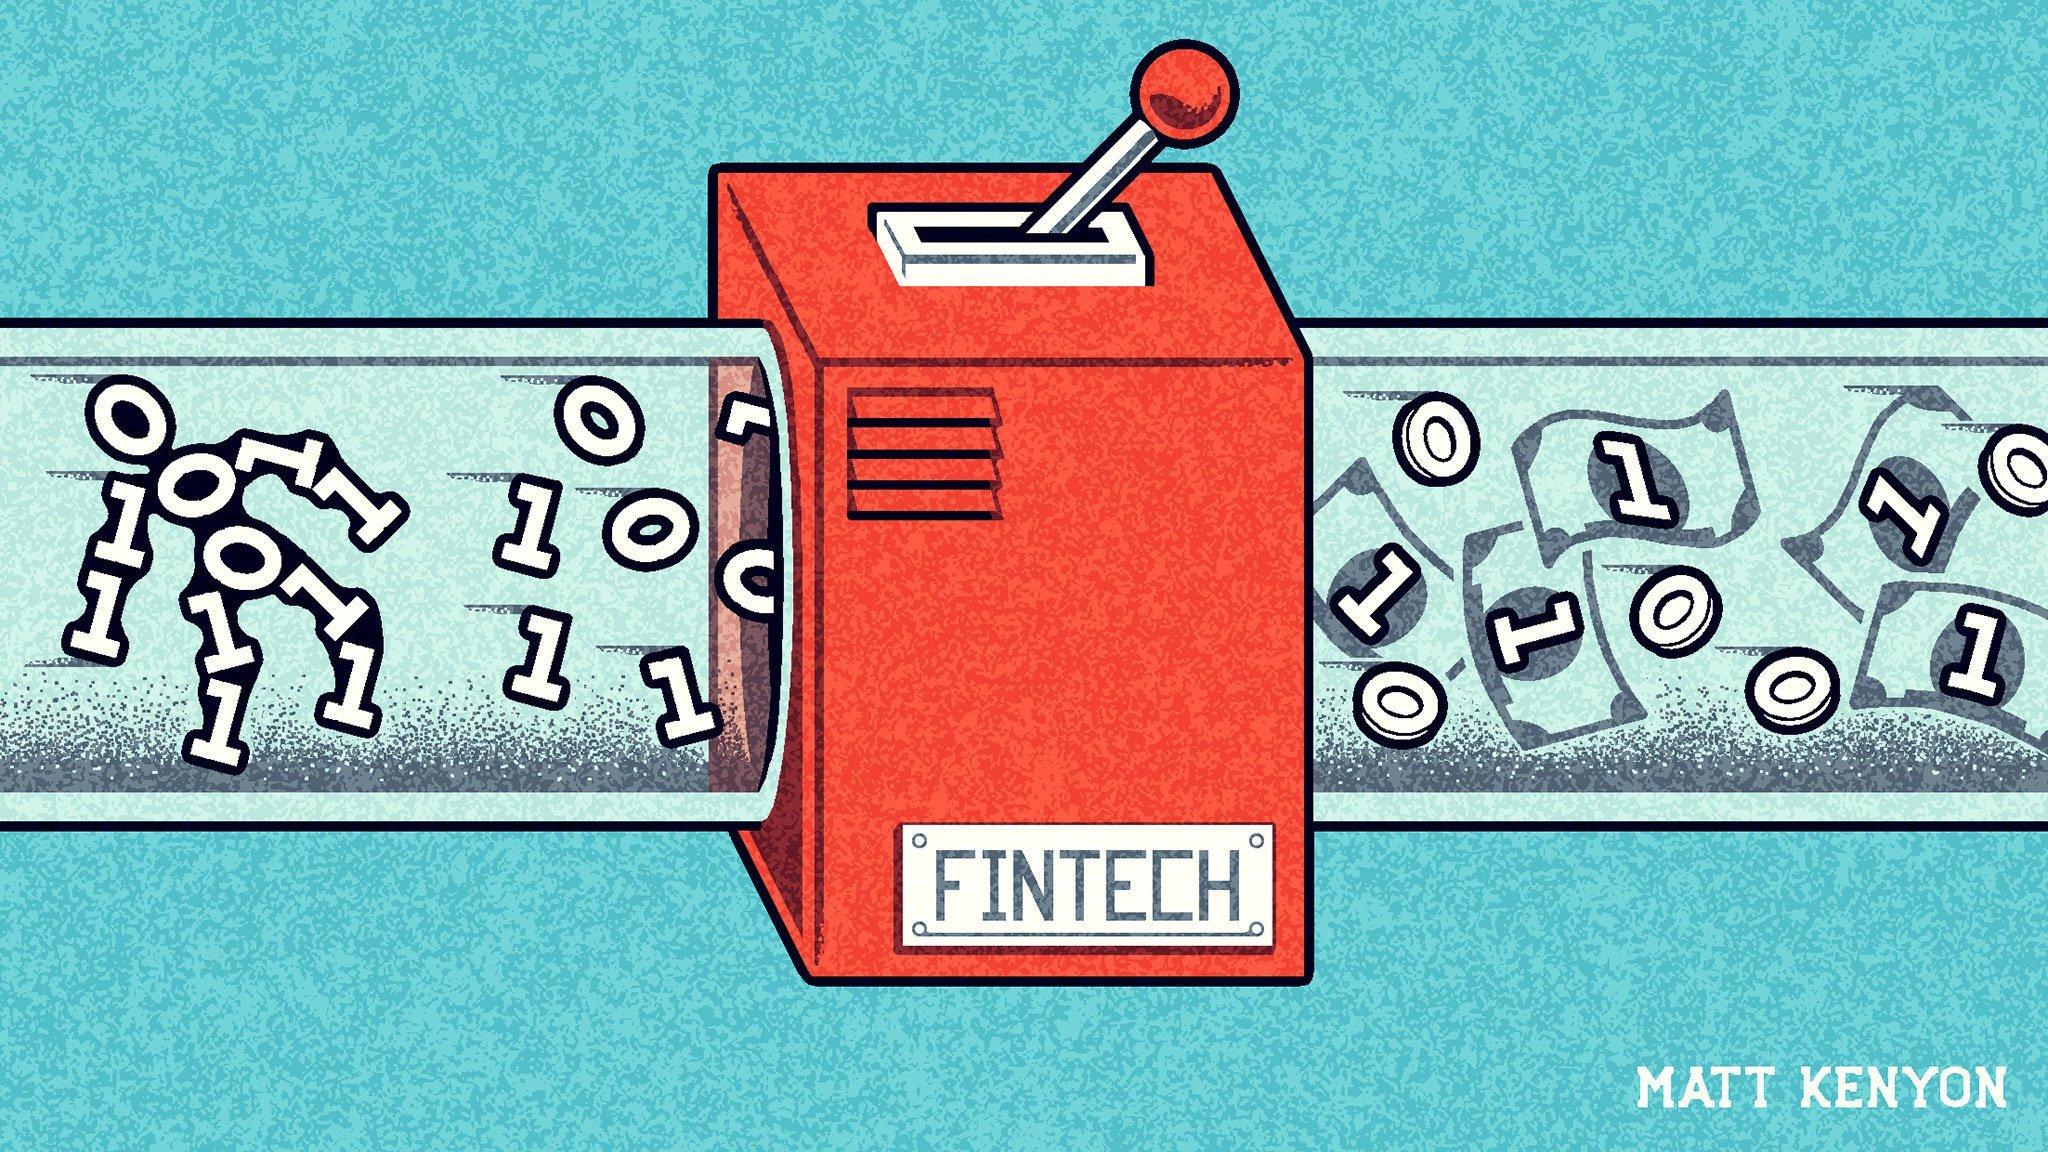 Banks jump on to the fintech bandwagon   Financial Times